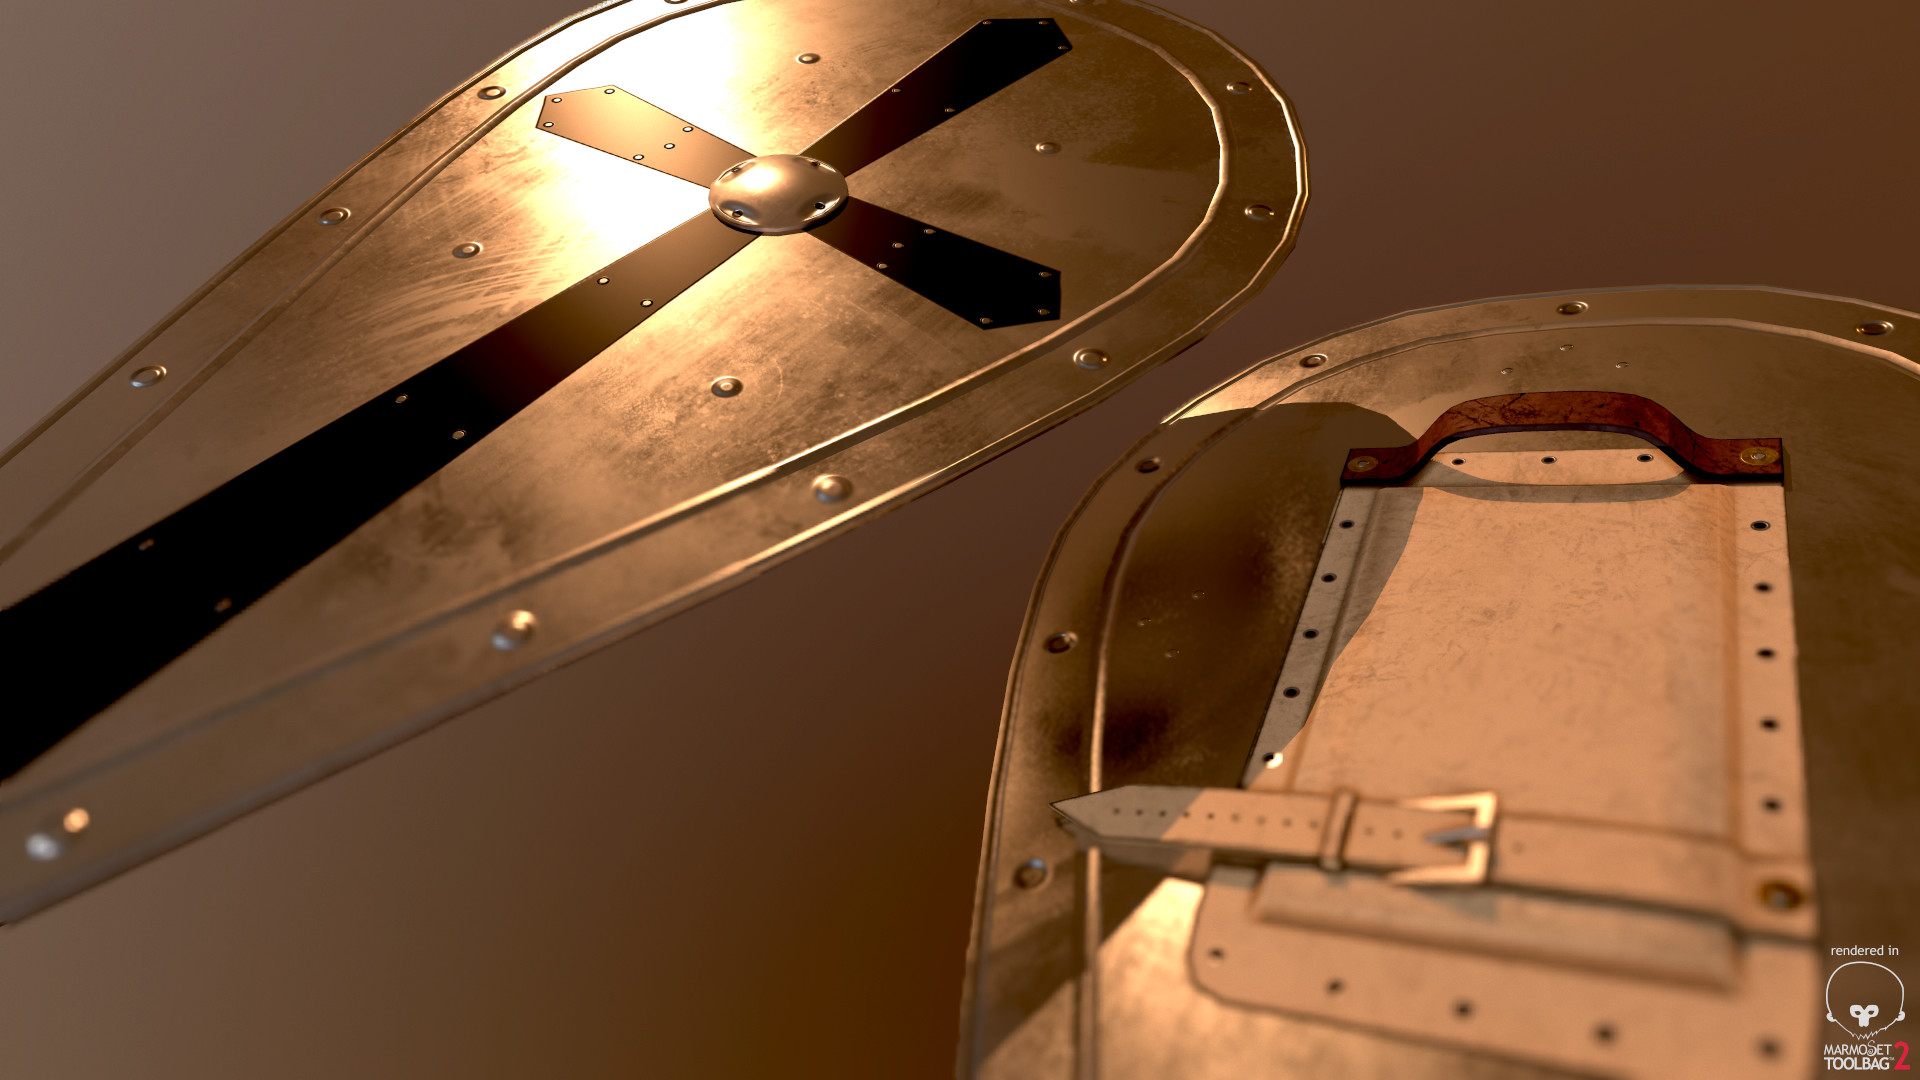 Bela csampai iron norman shield preview mt 02